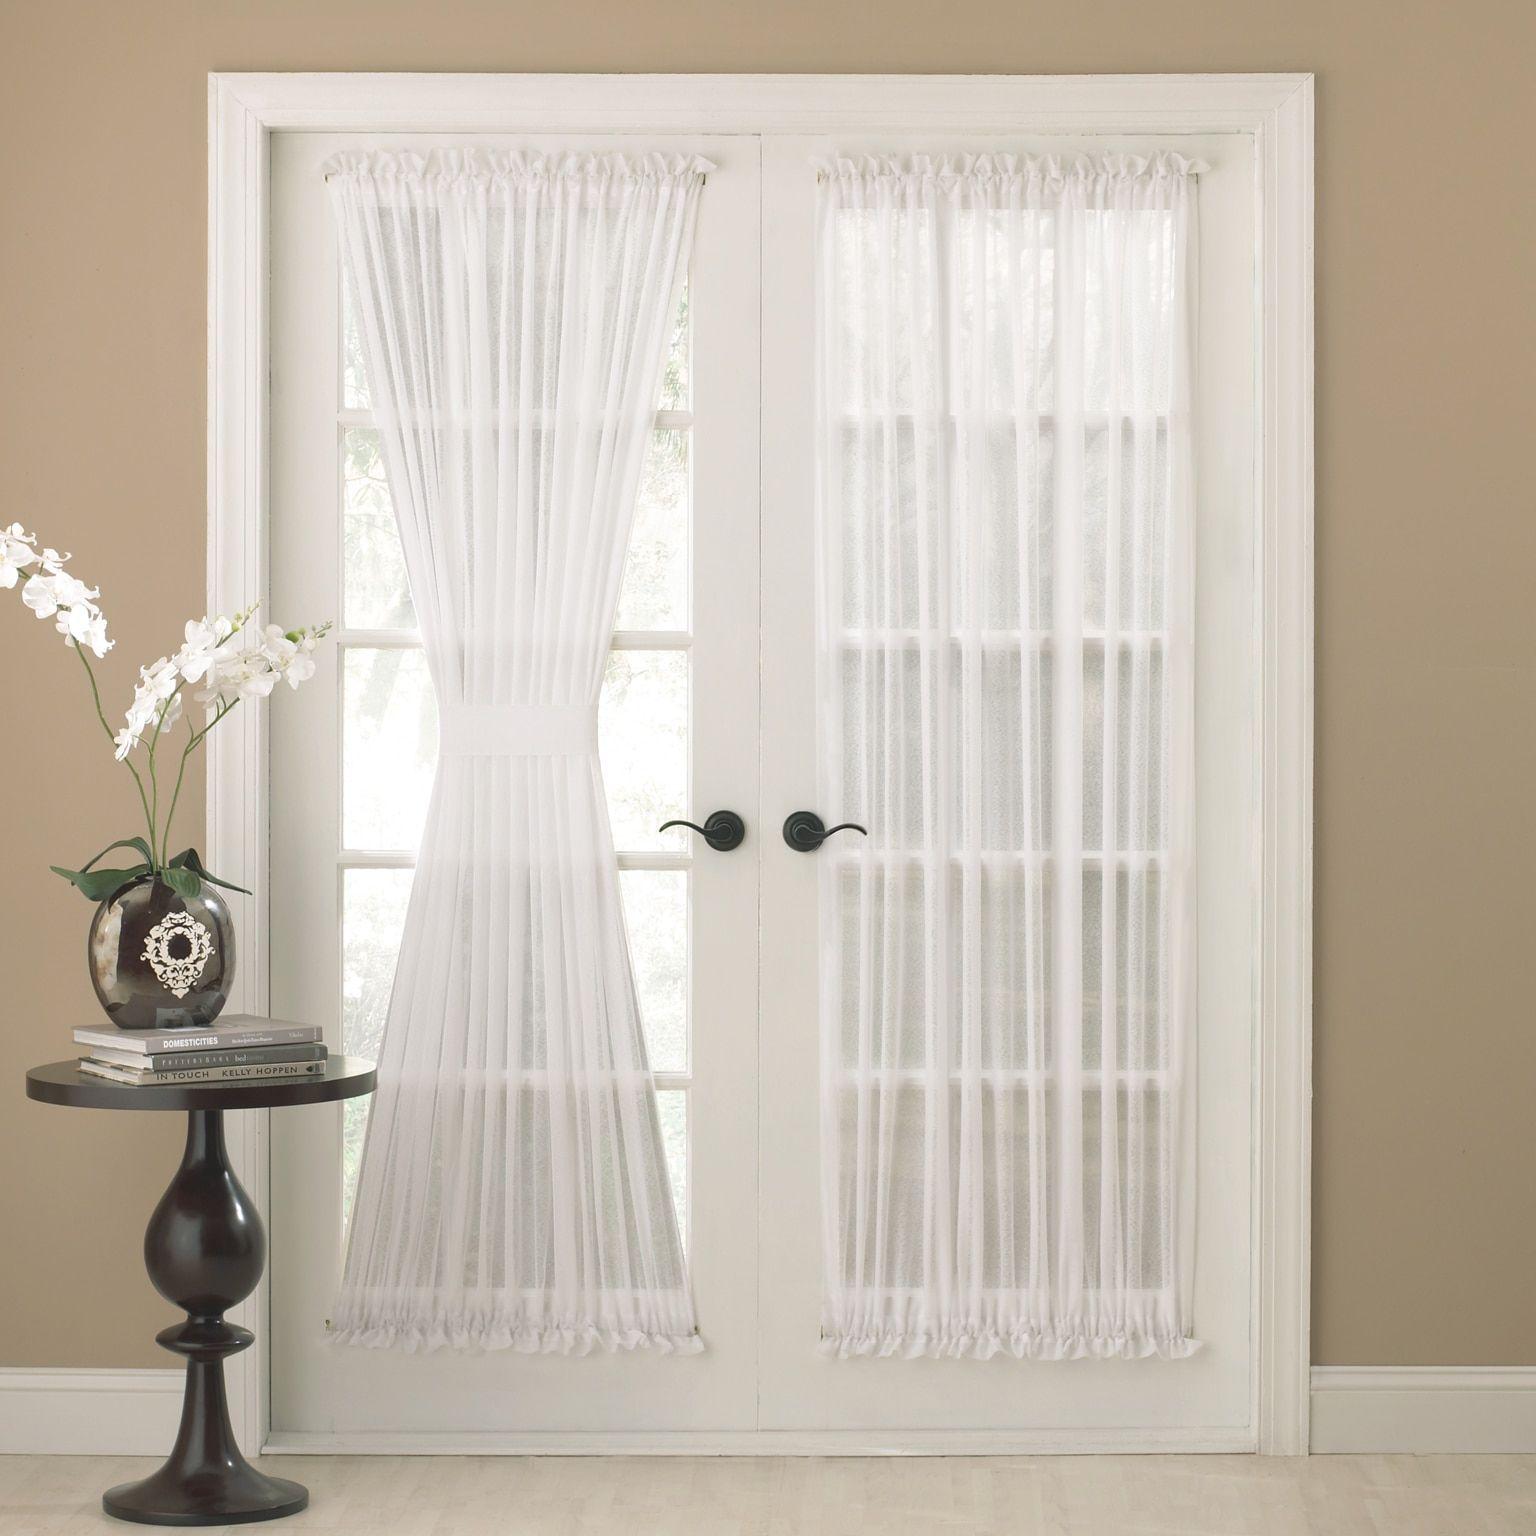 Semi Sheer 72 Inch Tailored Door Curtain Panel With Tieback 50 X